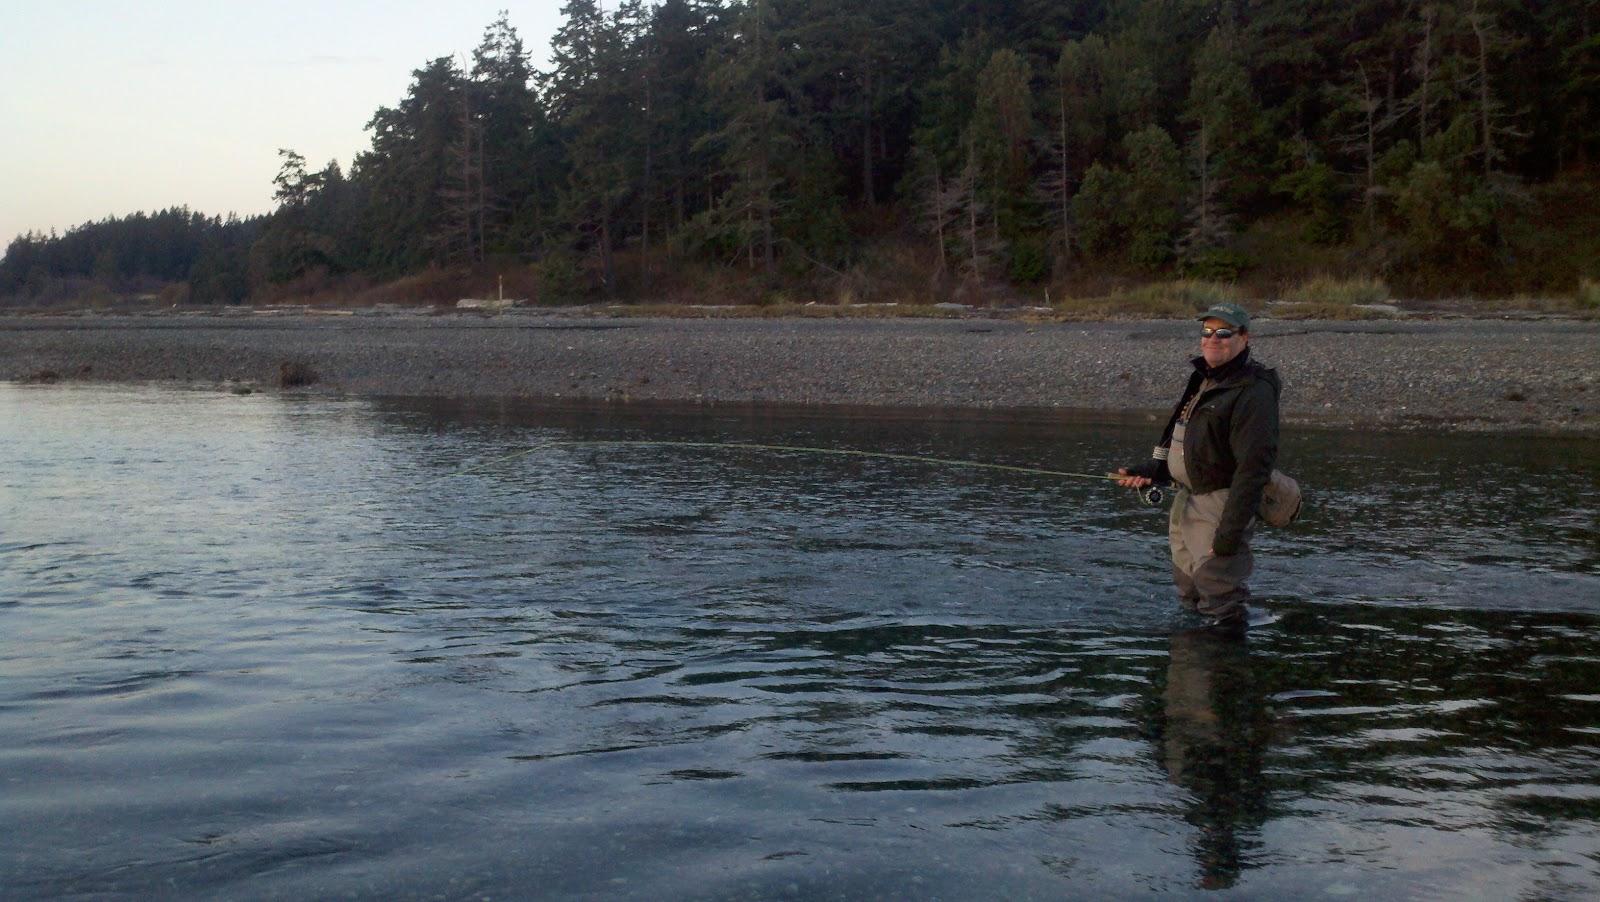 Washington fly fishing november 2012 for Washington fly fishing